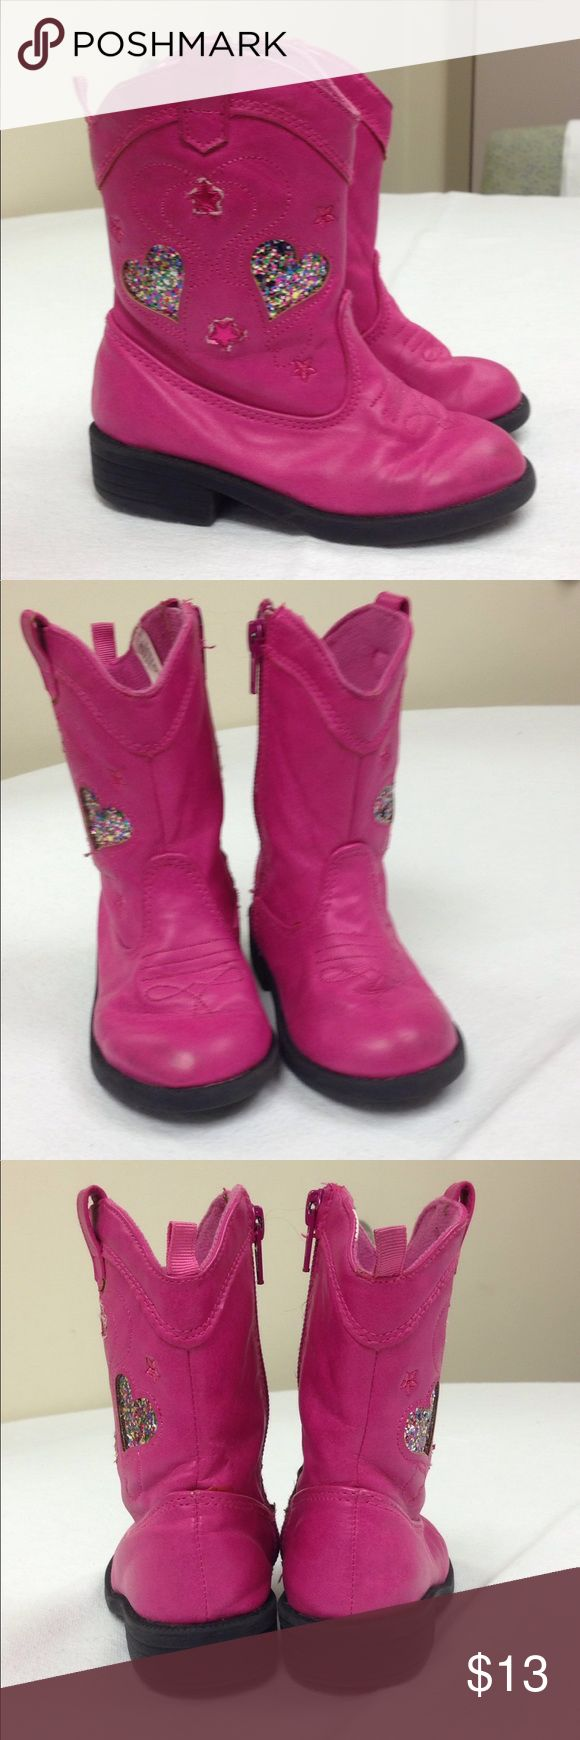 🌴NEW LISTING🌴 Koala Kids Cowboy Boots Pink. Glitter. Lined. Zipper closure. Show signs of wear. Size 7. (11/16) Koala Kids Shoes Boots